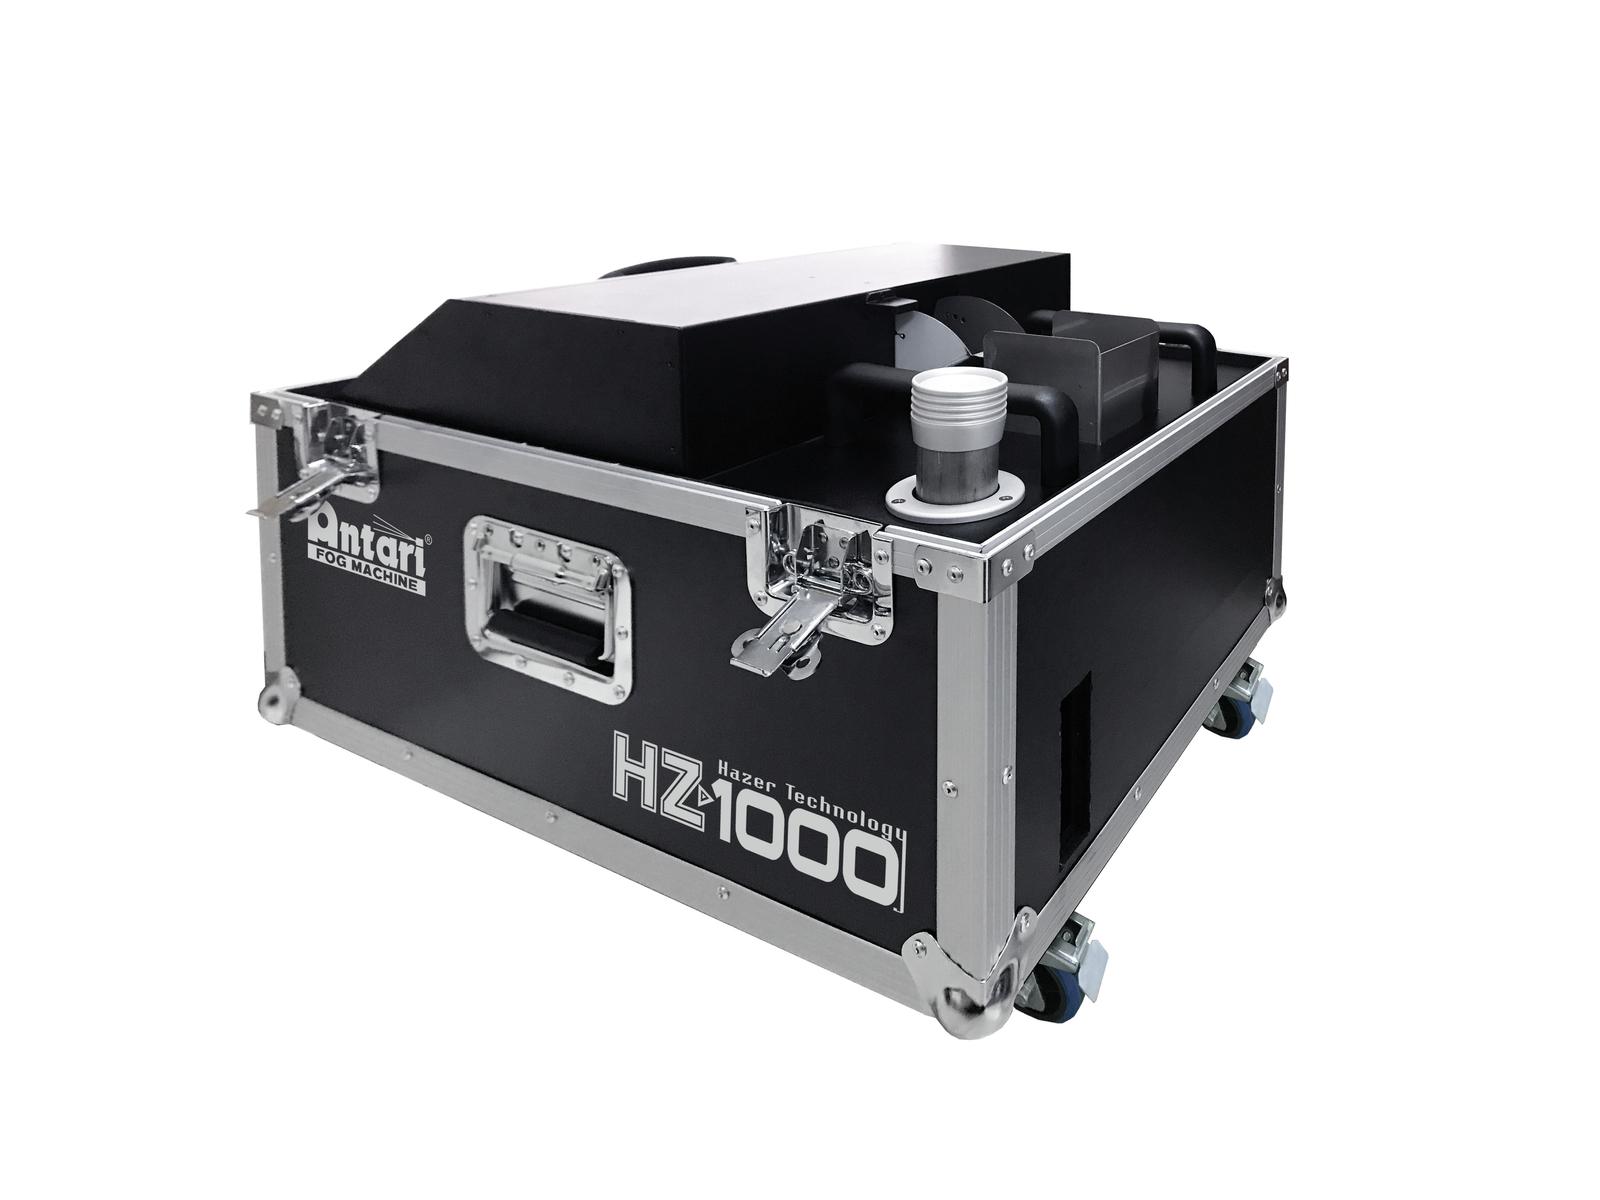 antari-hz-1000-hazer